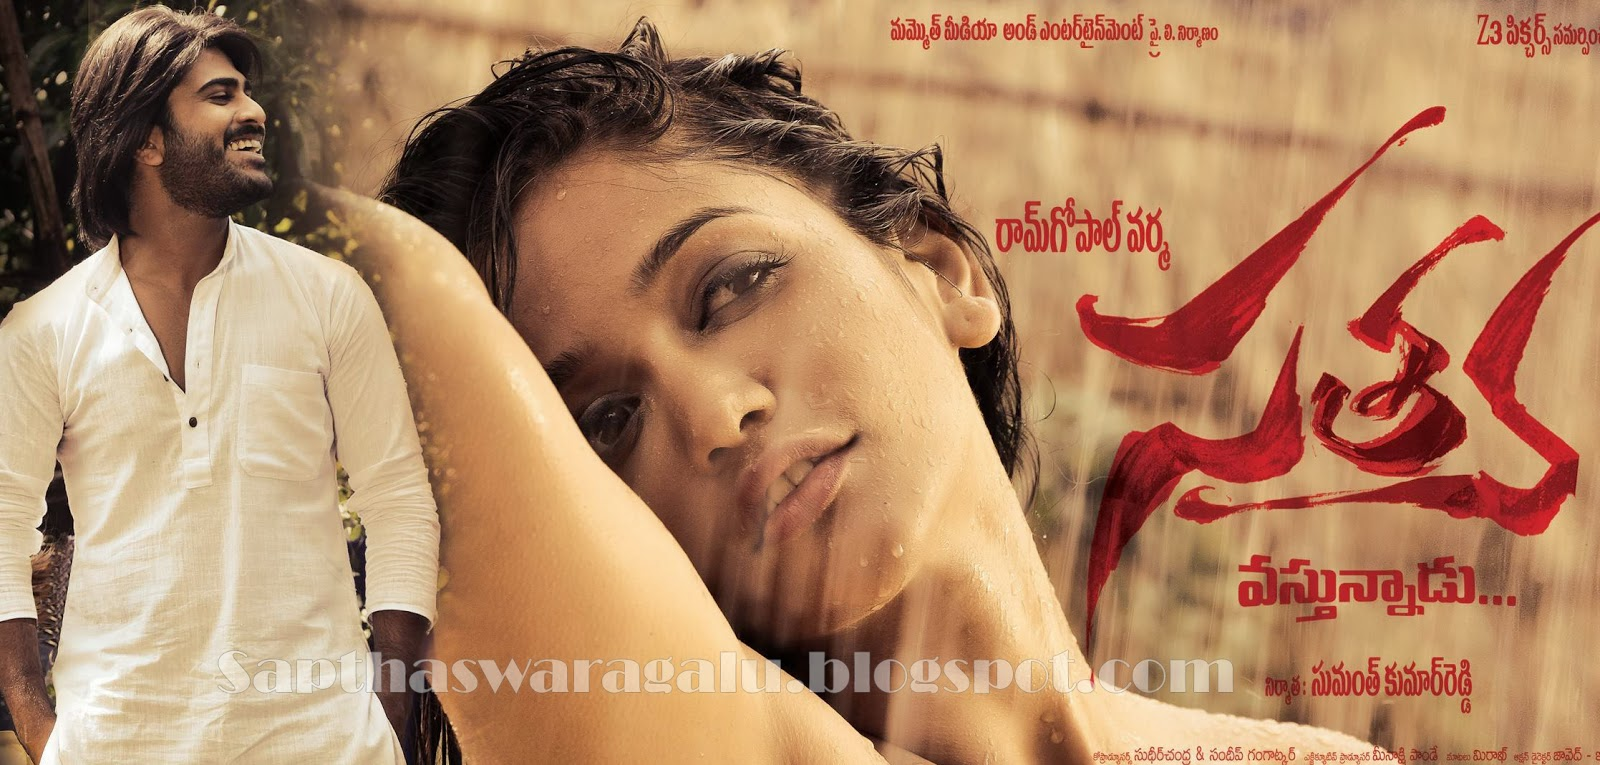 Satya 2 {2013} Telugu Latest Original Mp3 Songs Free